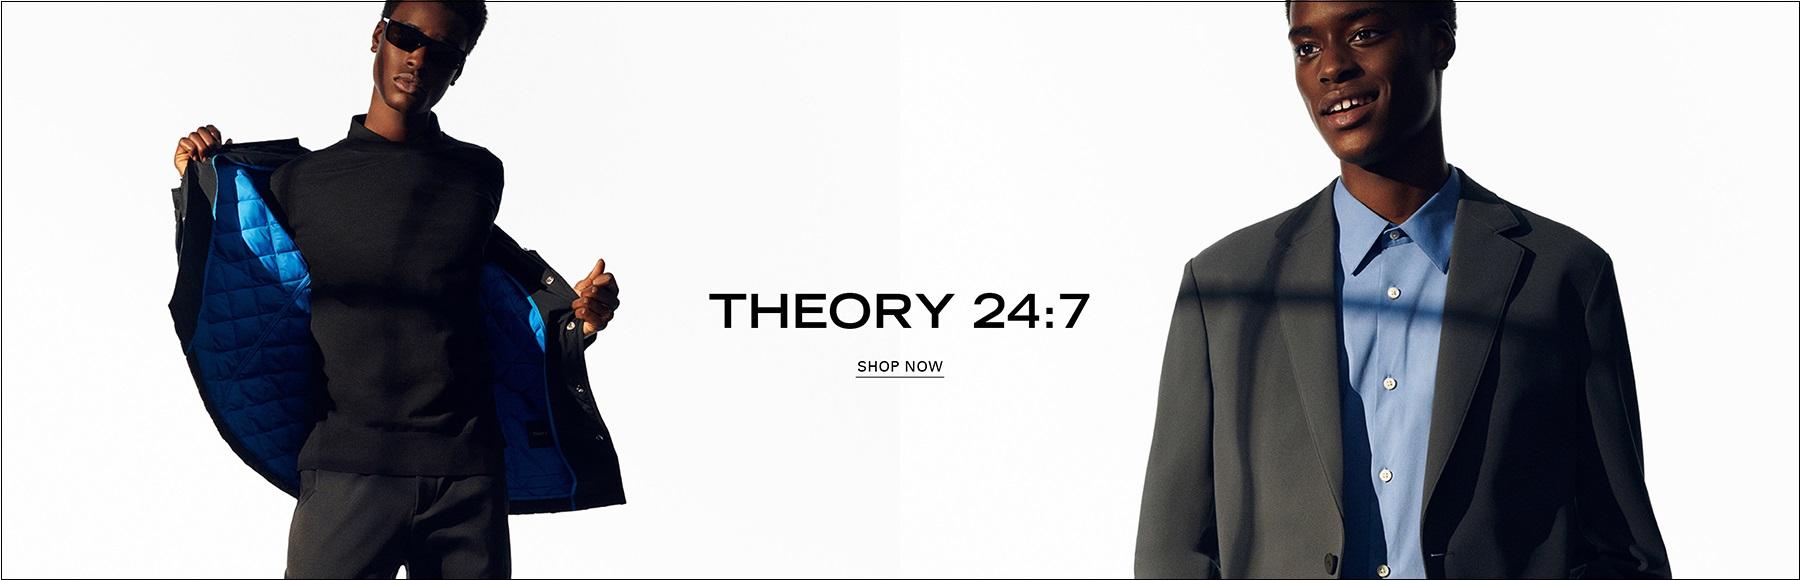 Theory 24:7